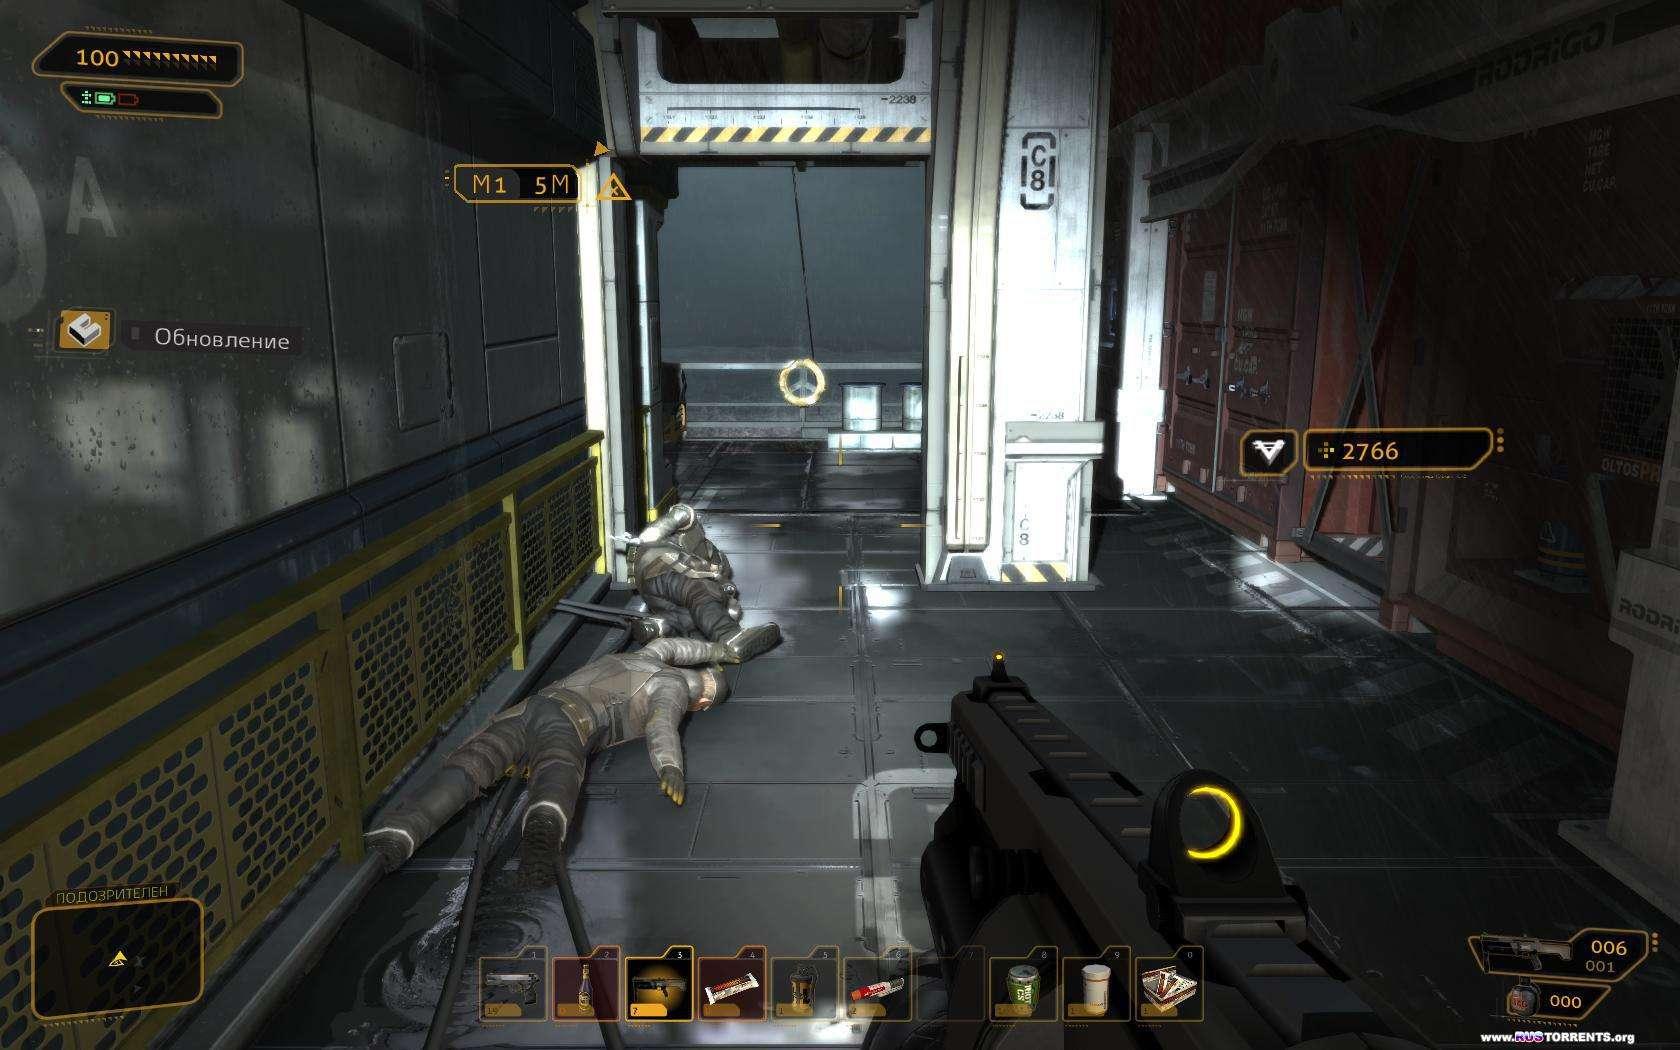 Deus Ex: Human Revolution™ – The Missing Link